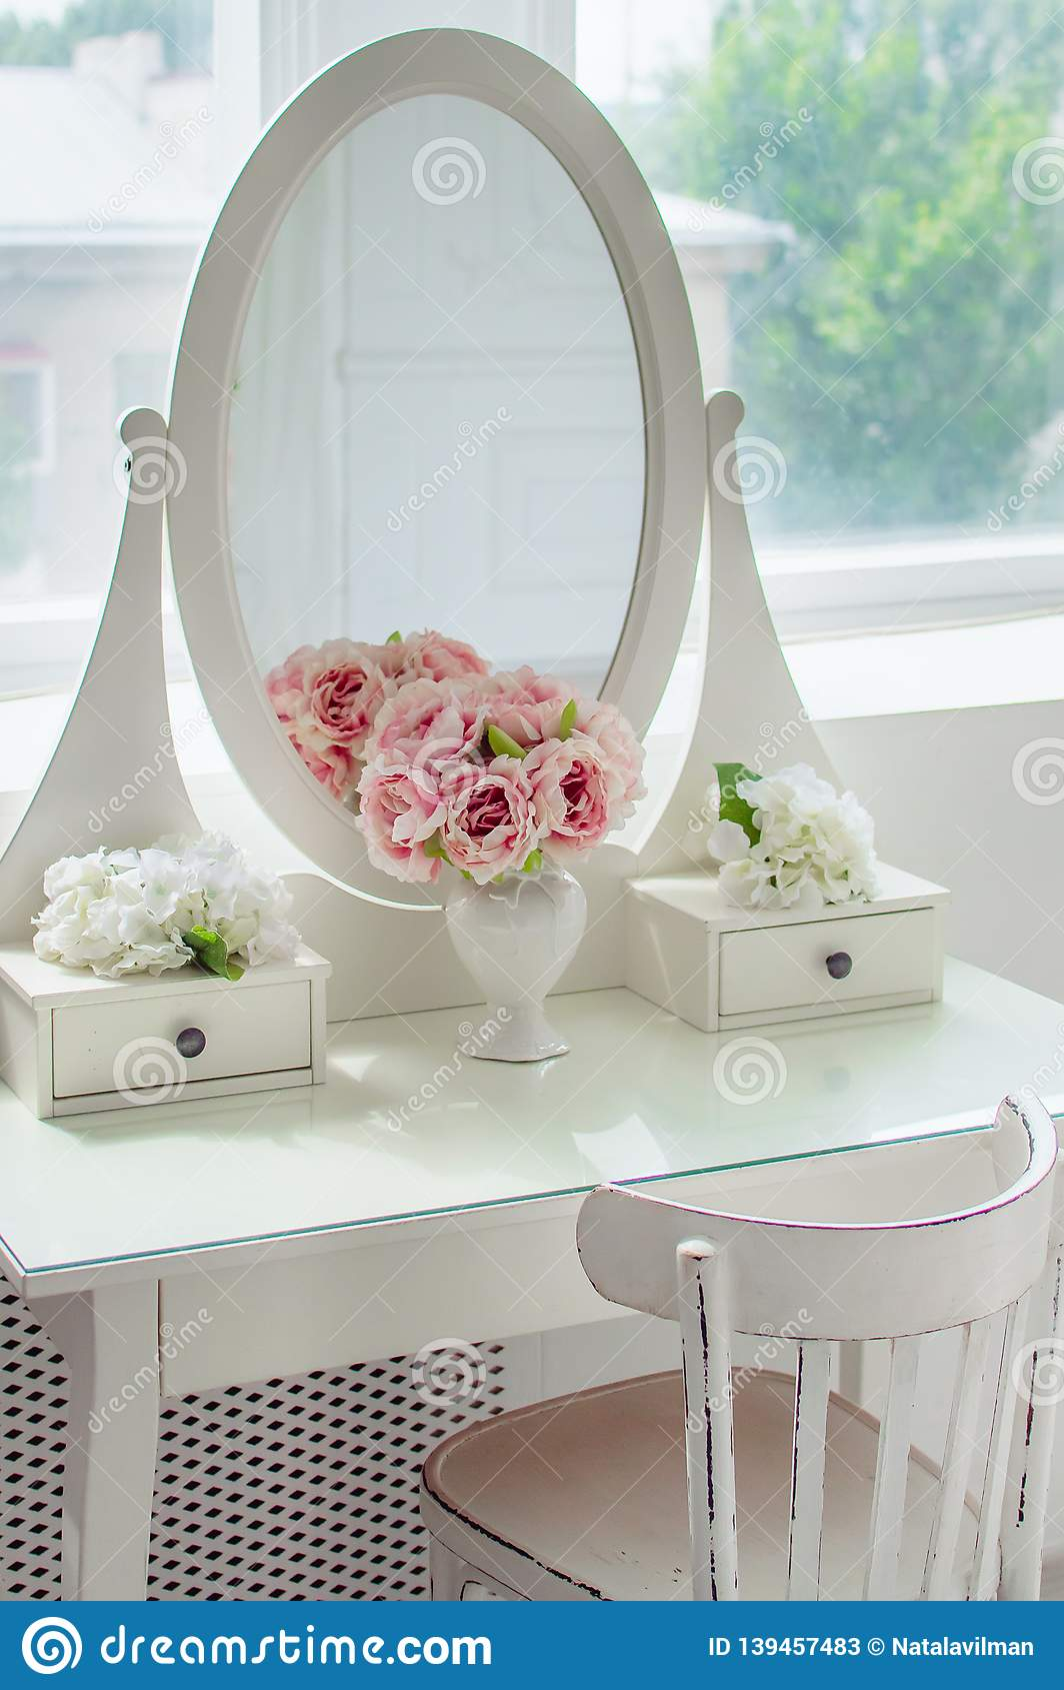 A beautiful white mirror on the table. Elegant bright interior